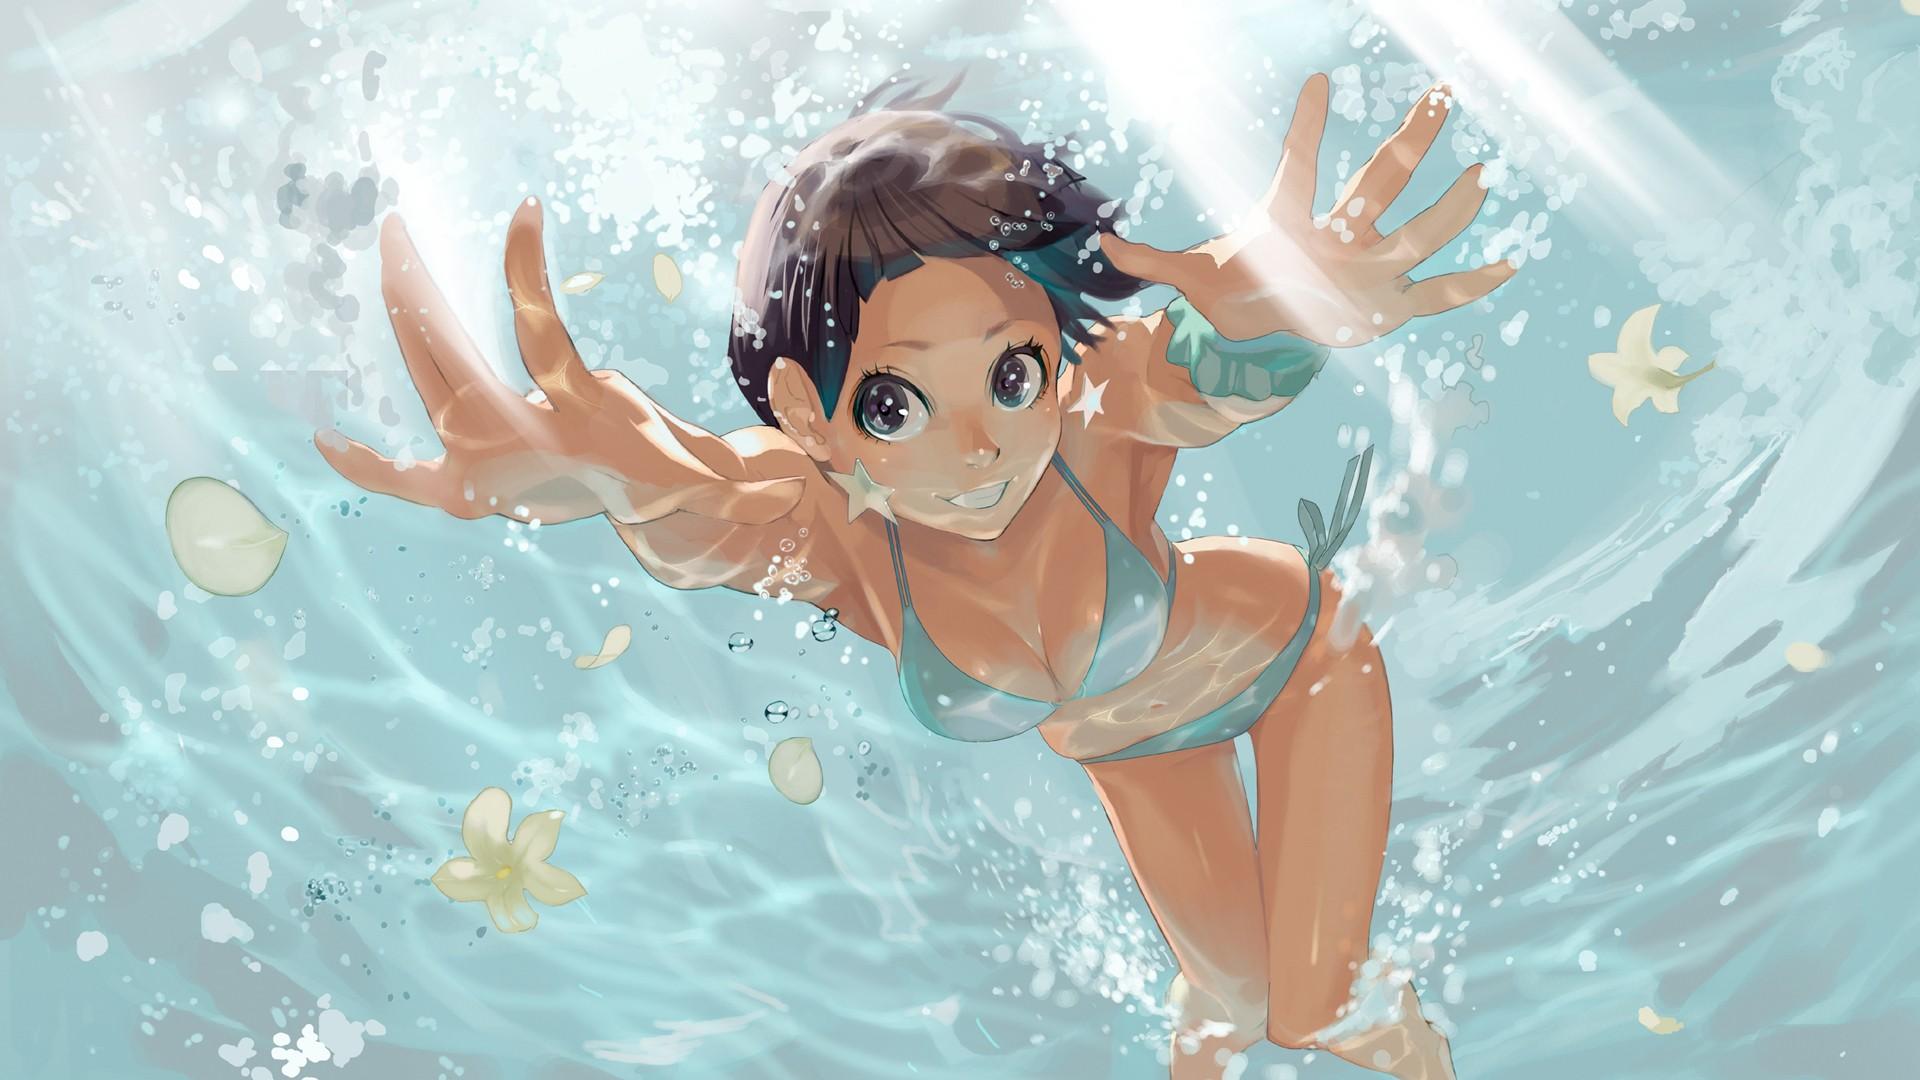 Wallpaper Manga Underwater Ecchi Computer Wallpaper